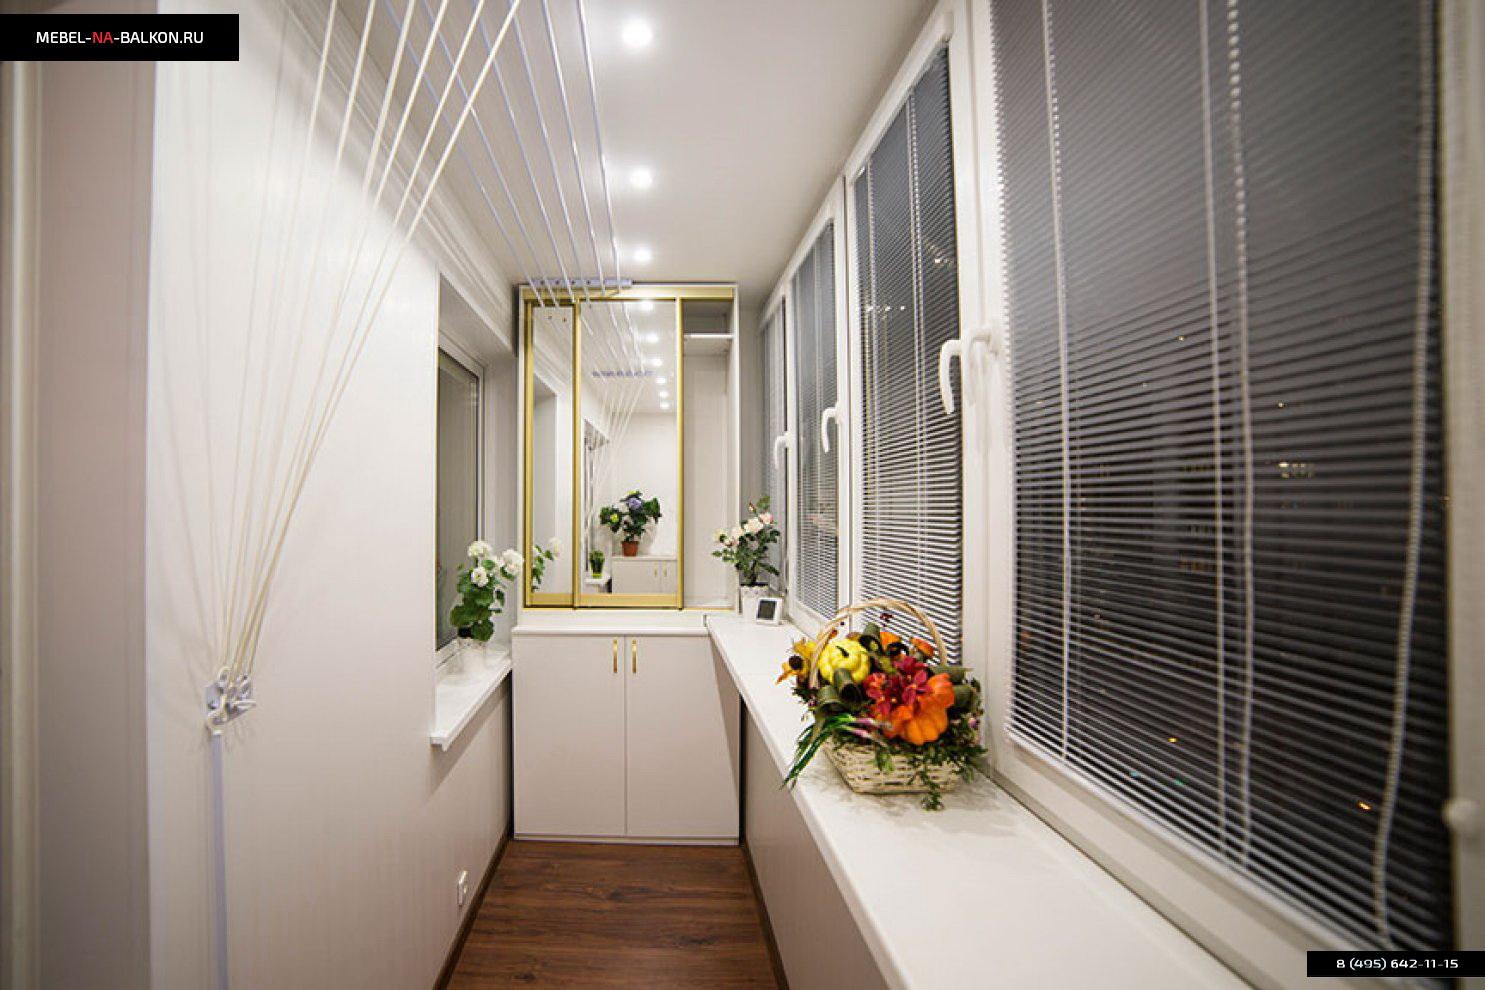 Отделка балкона отделка балкона под ключ отделка балконов в .